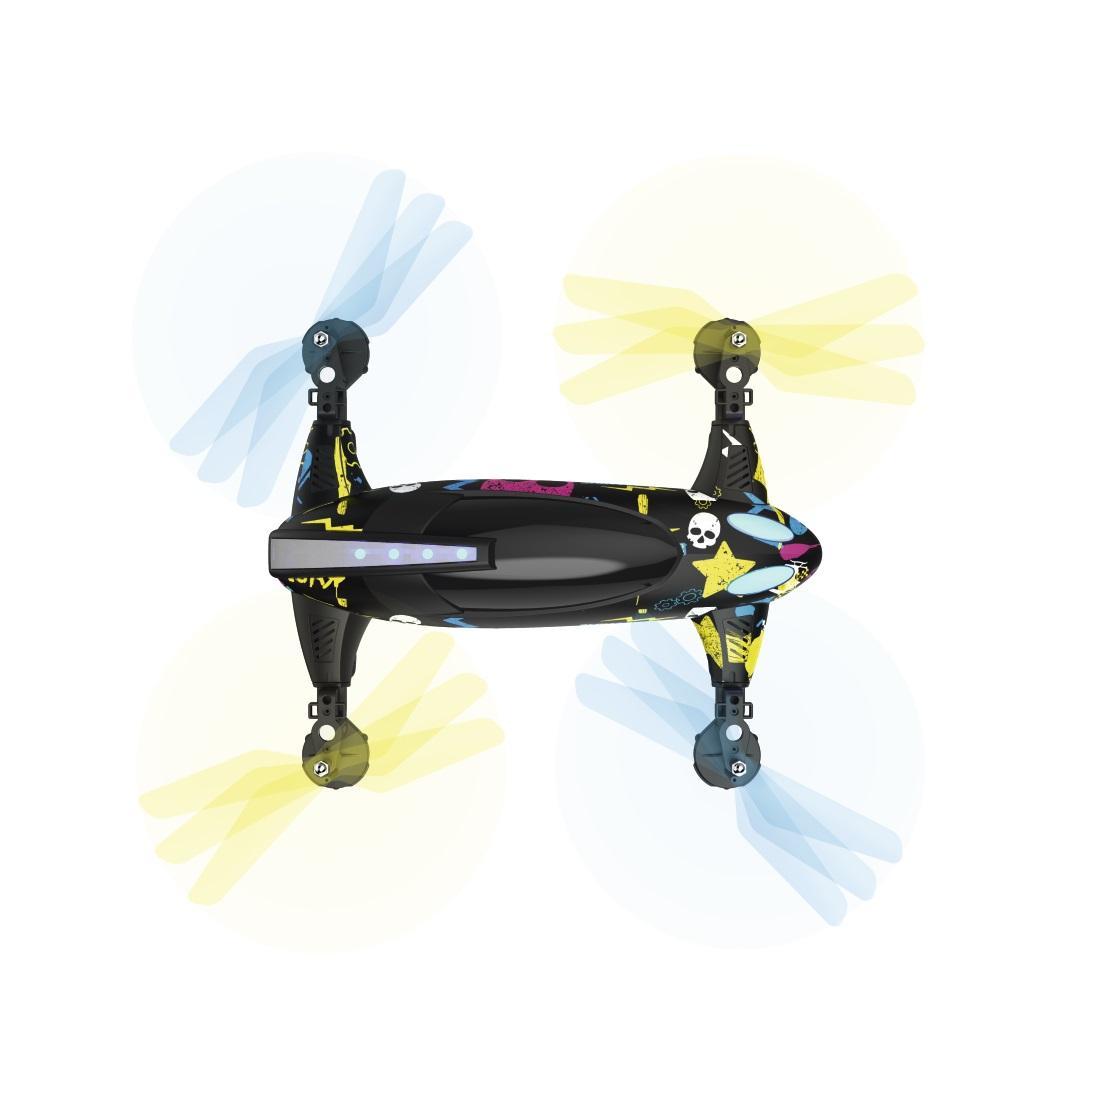 Дрон/кола - 2 в 1 HAMA Racemachine, 6-осов G-сензор, 720p камера